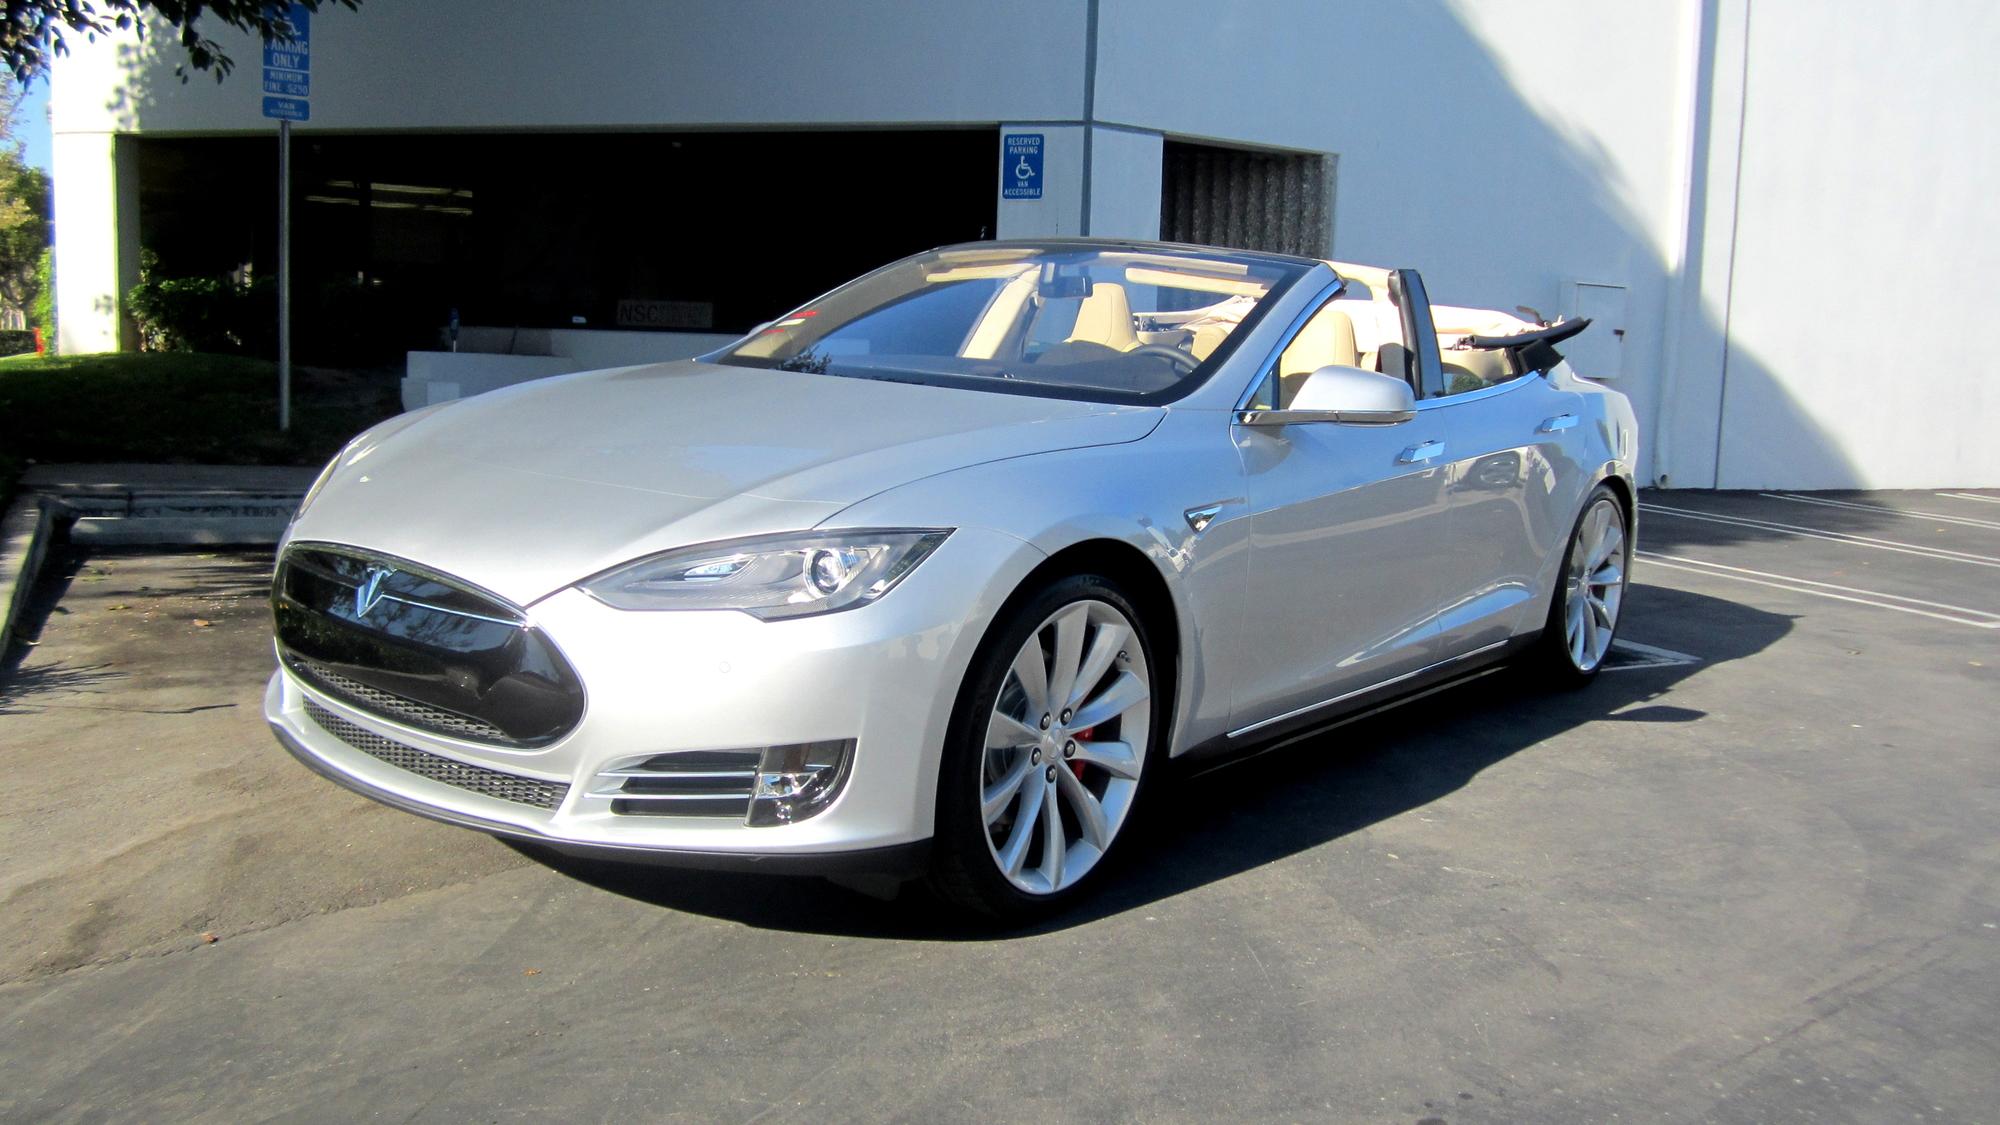 Tesla Model S convertible by Newport Convertible Engineering